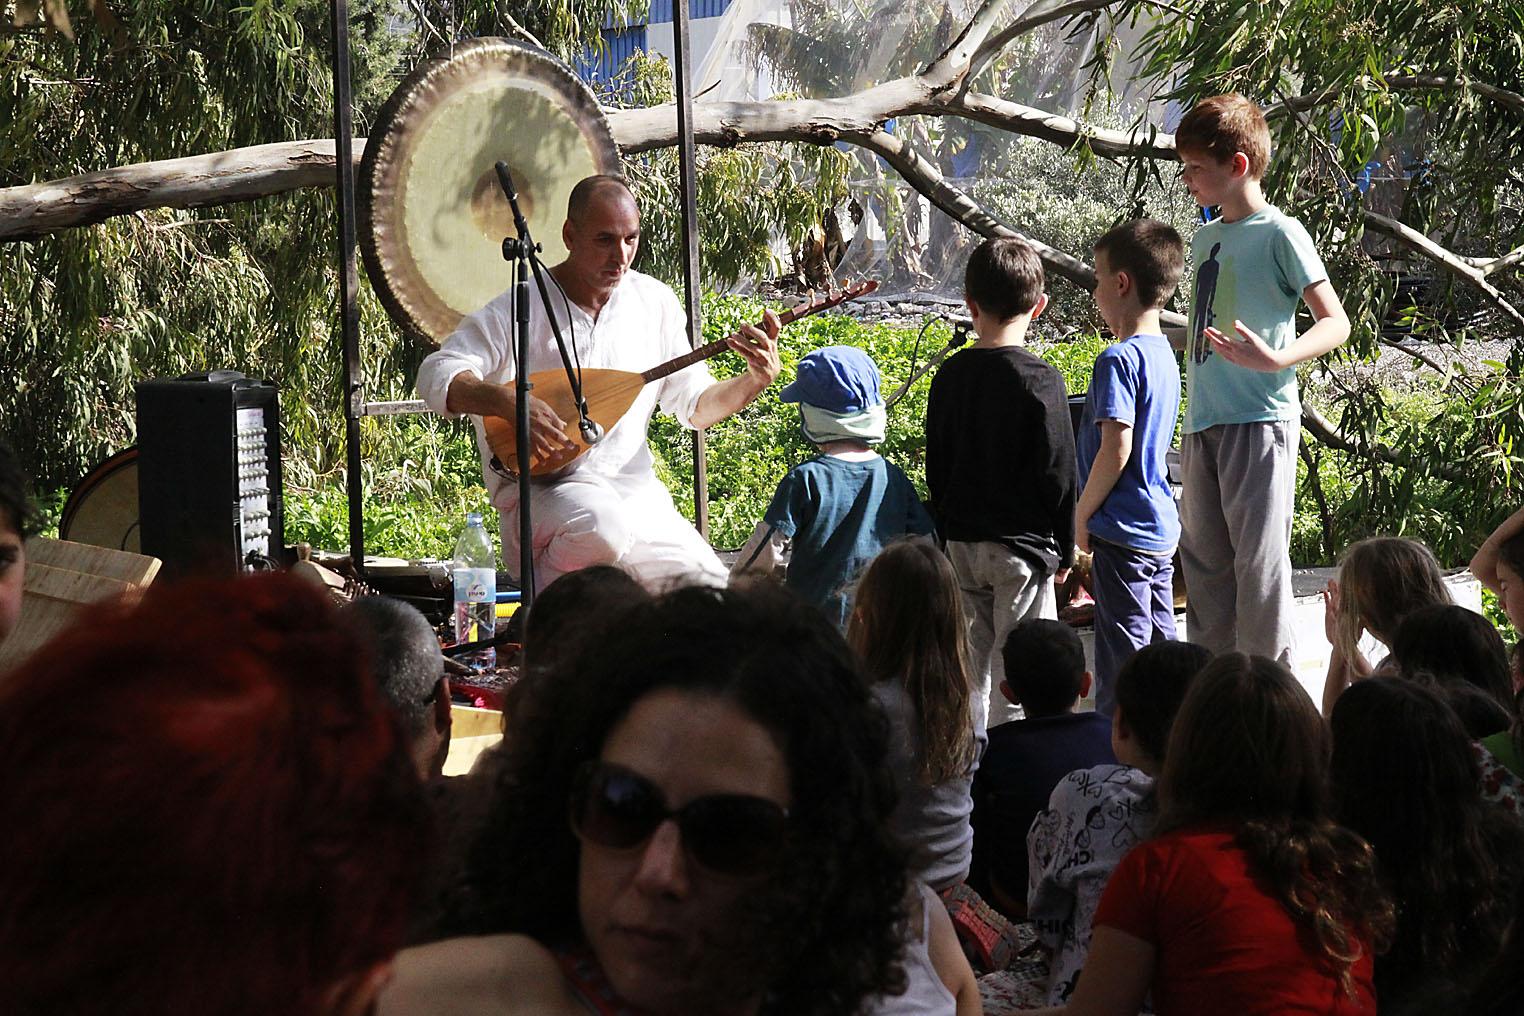 Kibbutz Ein Carmel